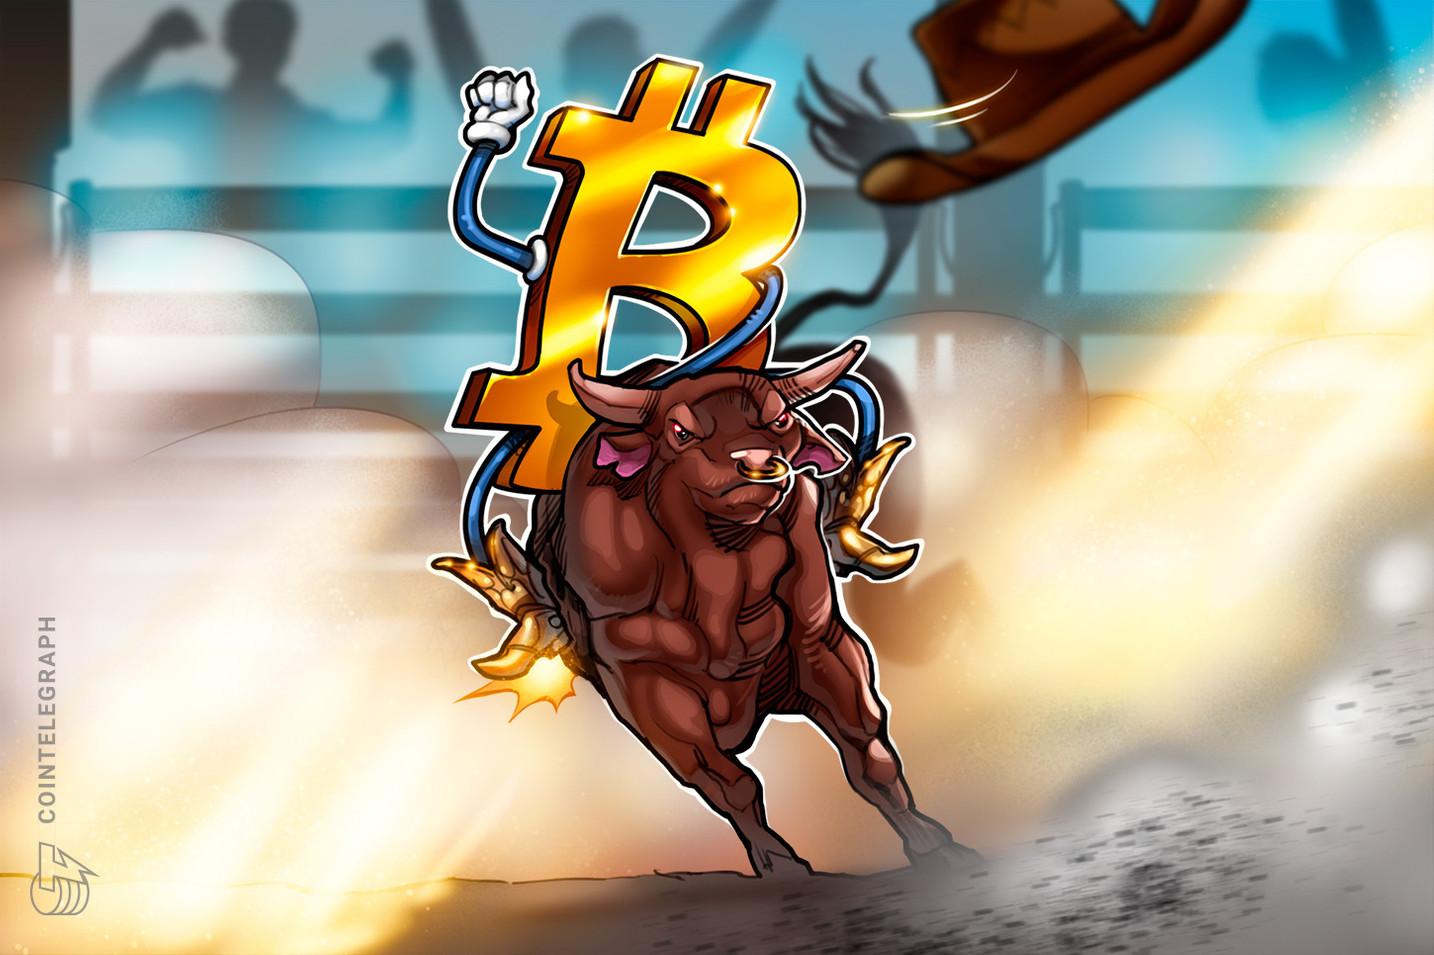 Bitcoin Price Rallies Higher but Must Hit $8K to Start a Bull Market